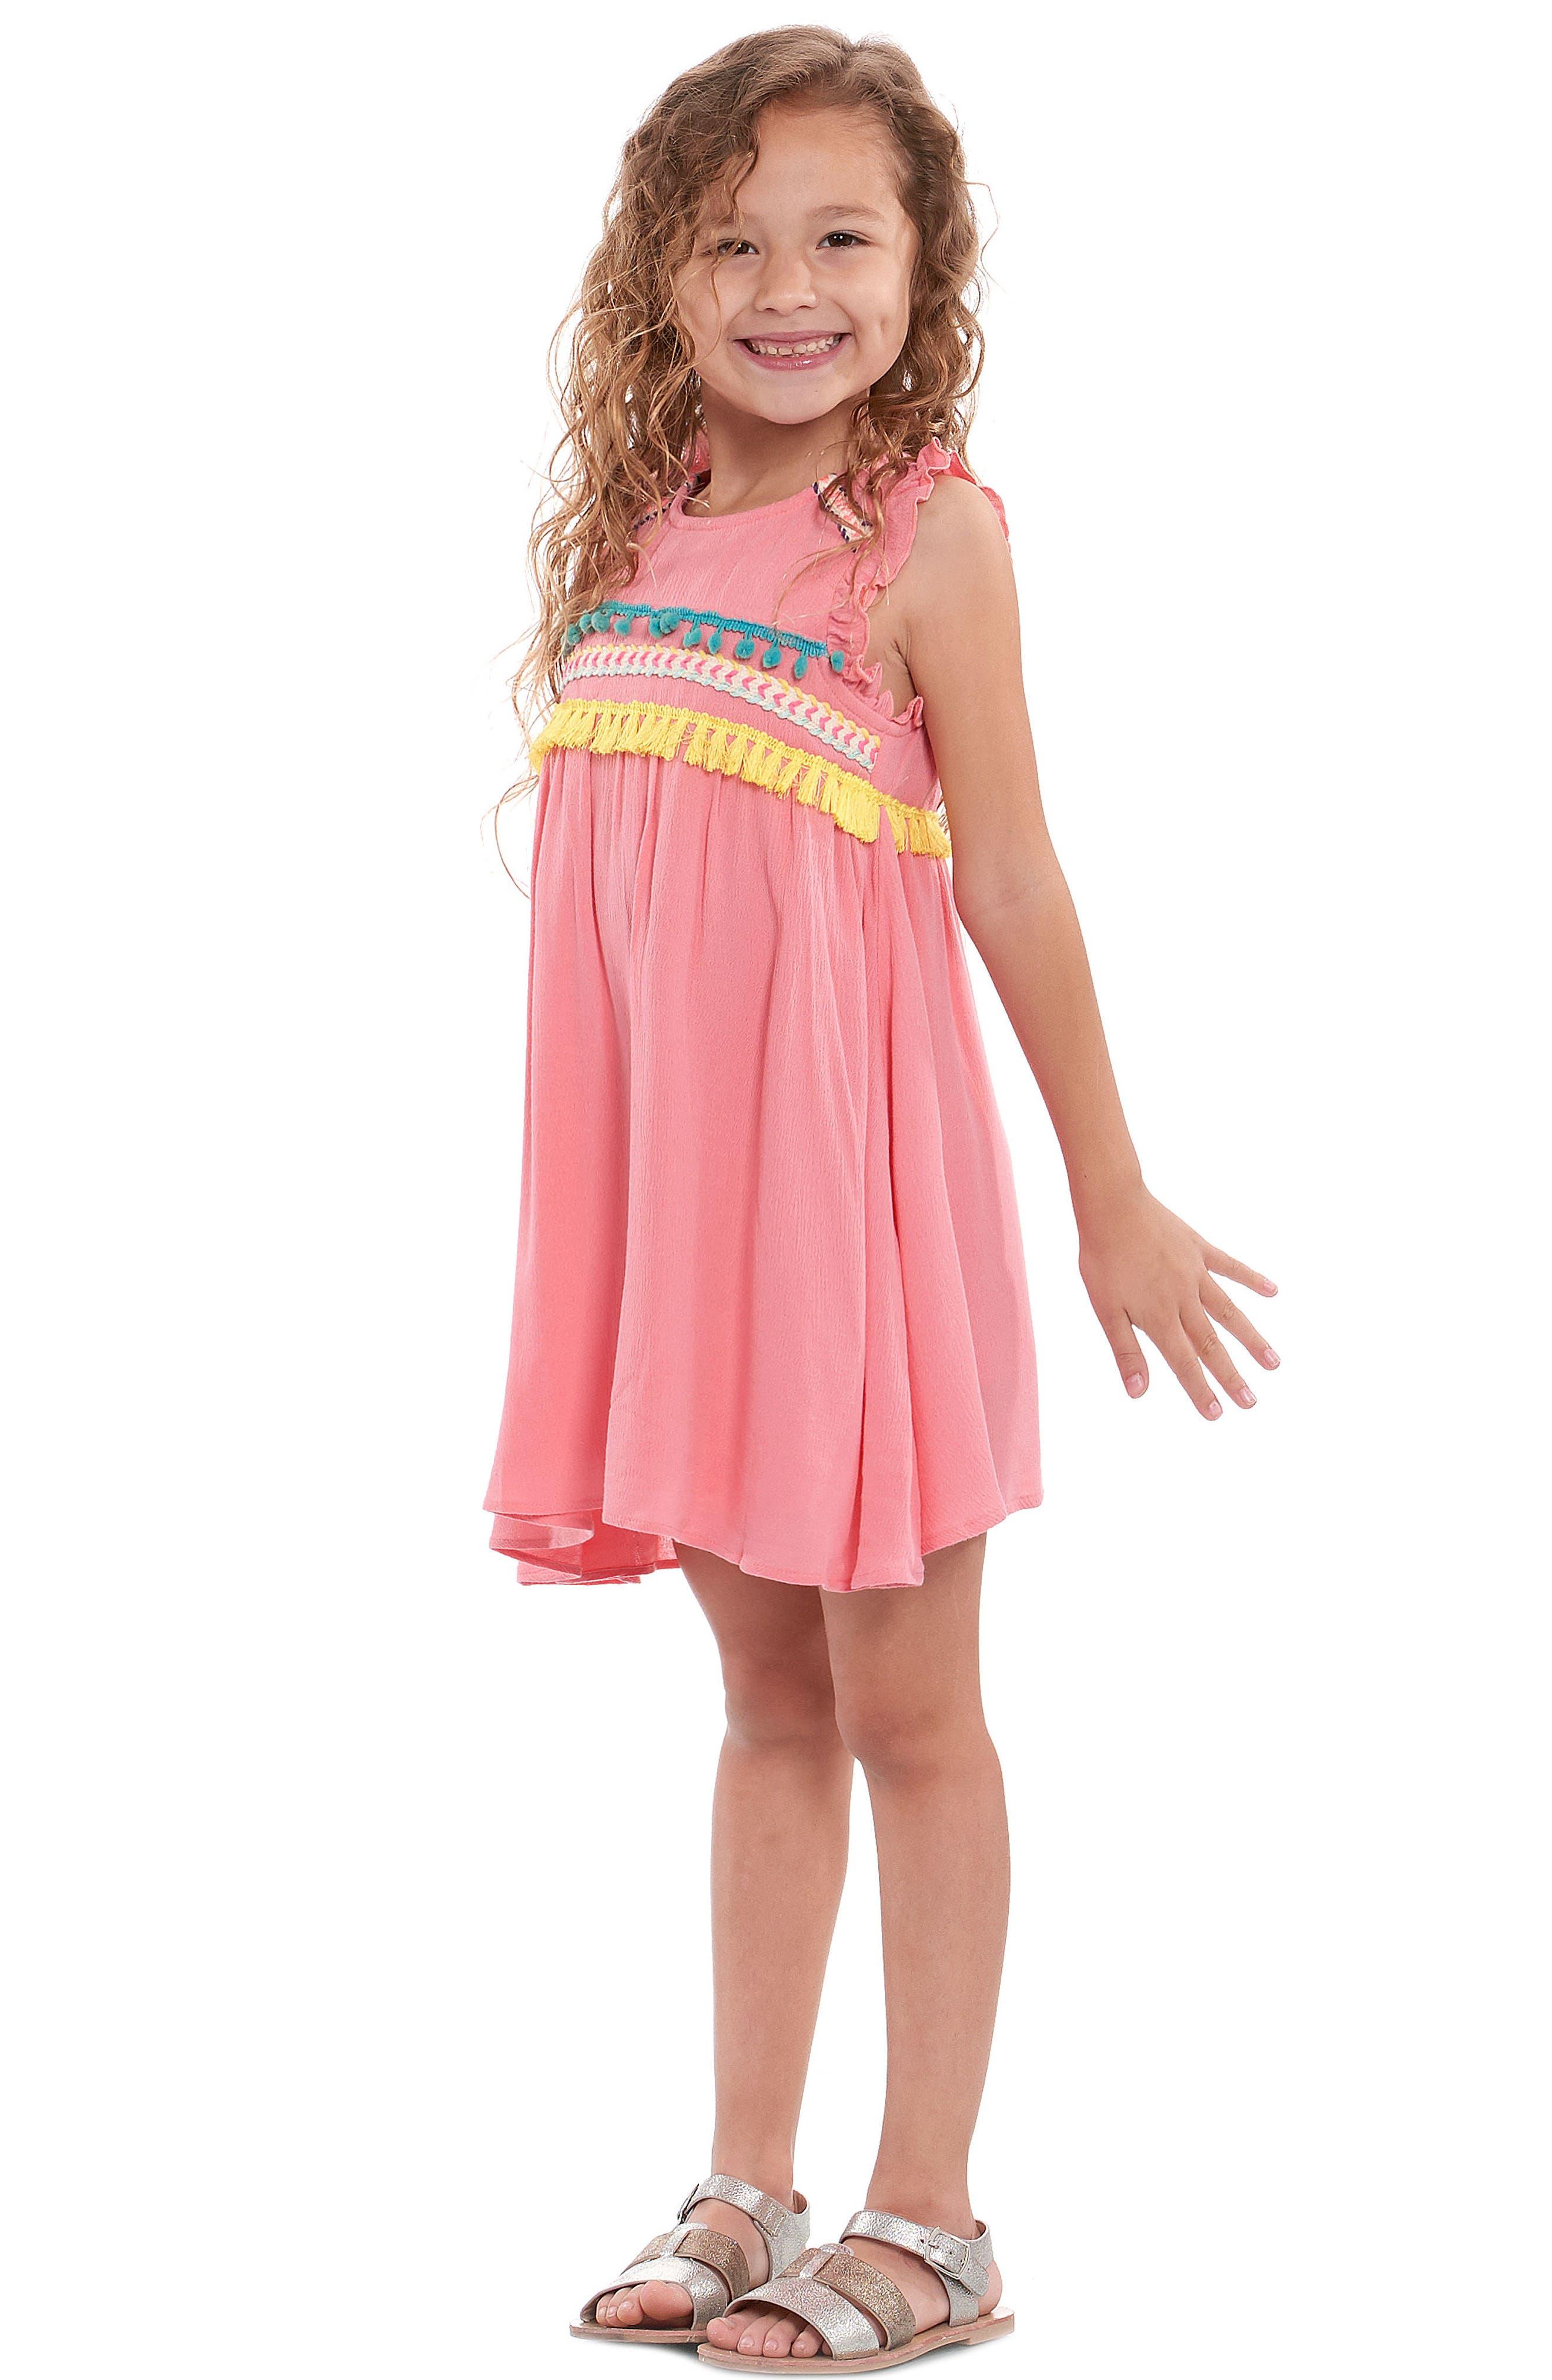 Trim Babydoll Dress,                             Alternate thumbnail 6, color,                             951